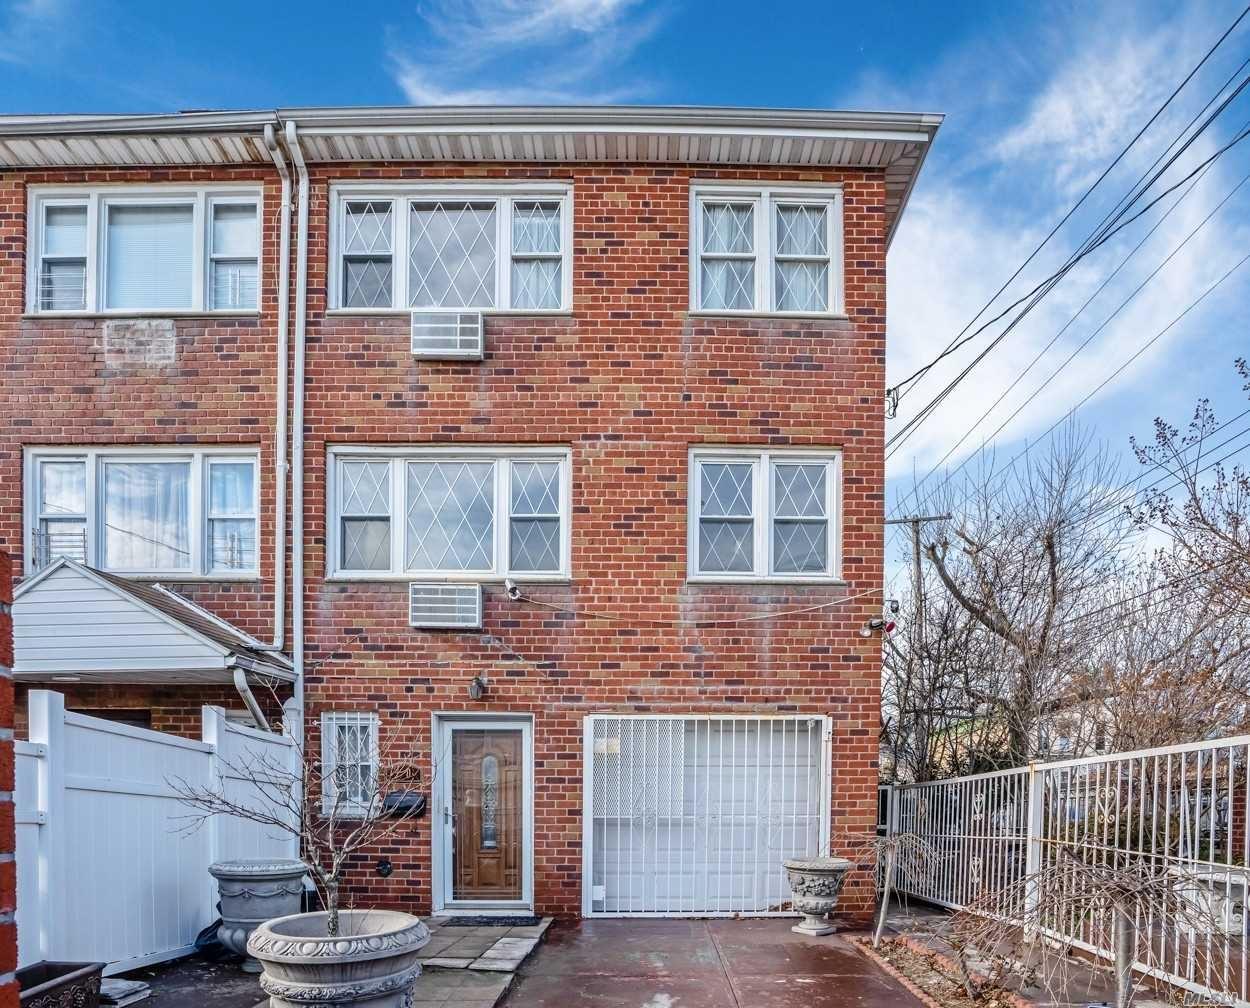 220 Forbell Street, Brooklyn, NY 11208 - MLS#: 3191651